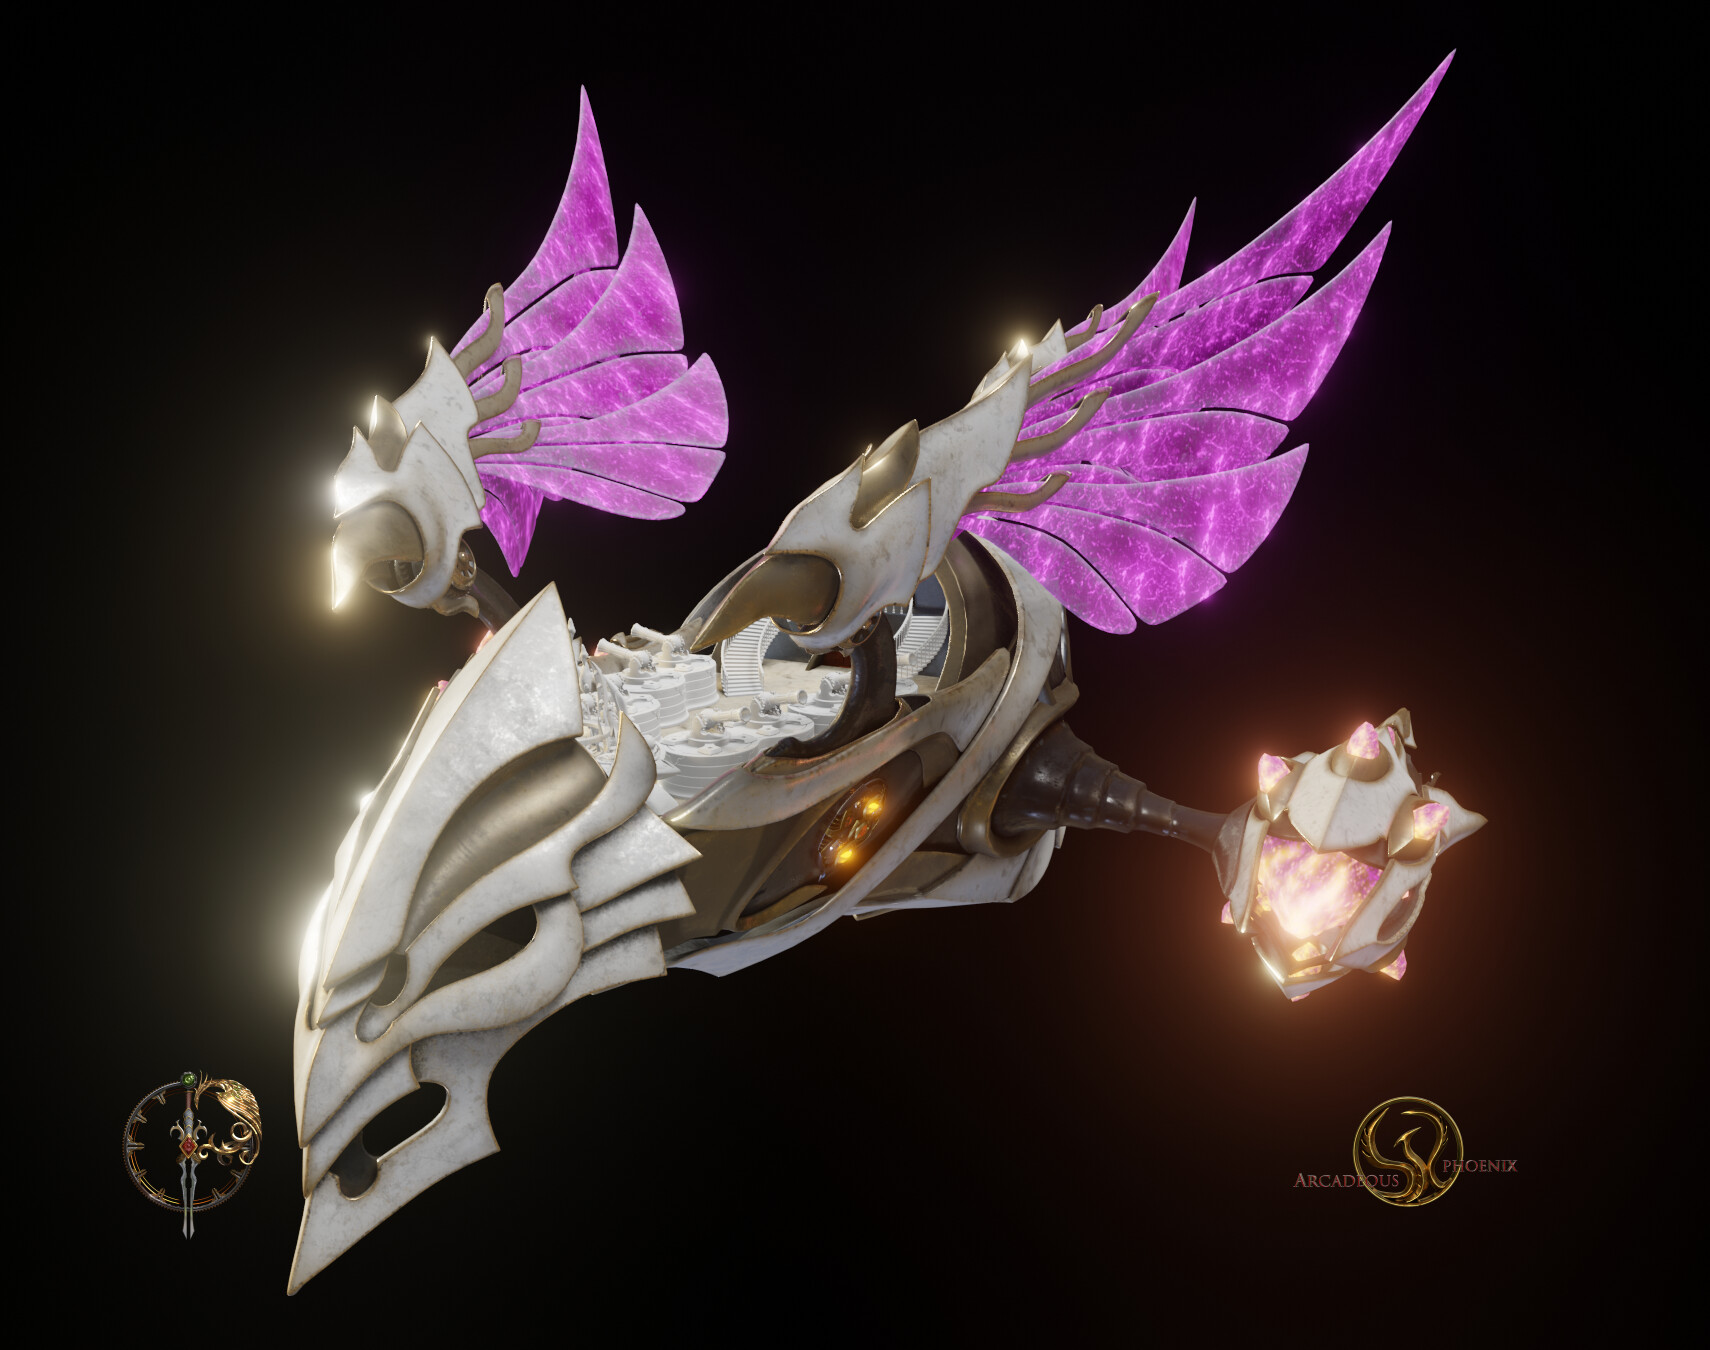 Arcadeous phoenix pd5